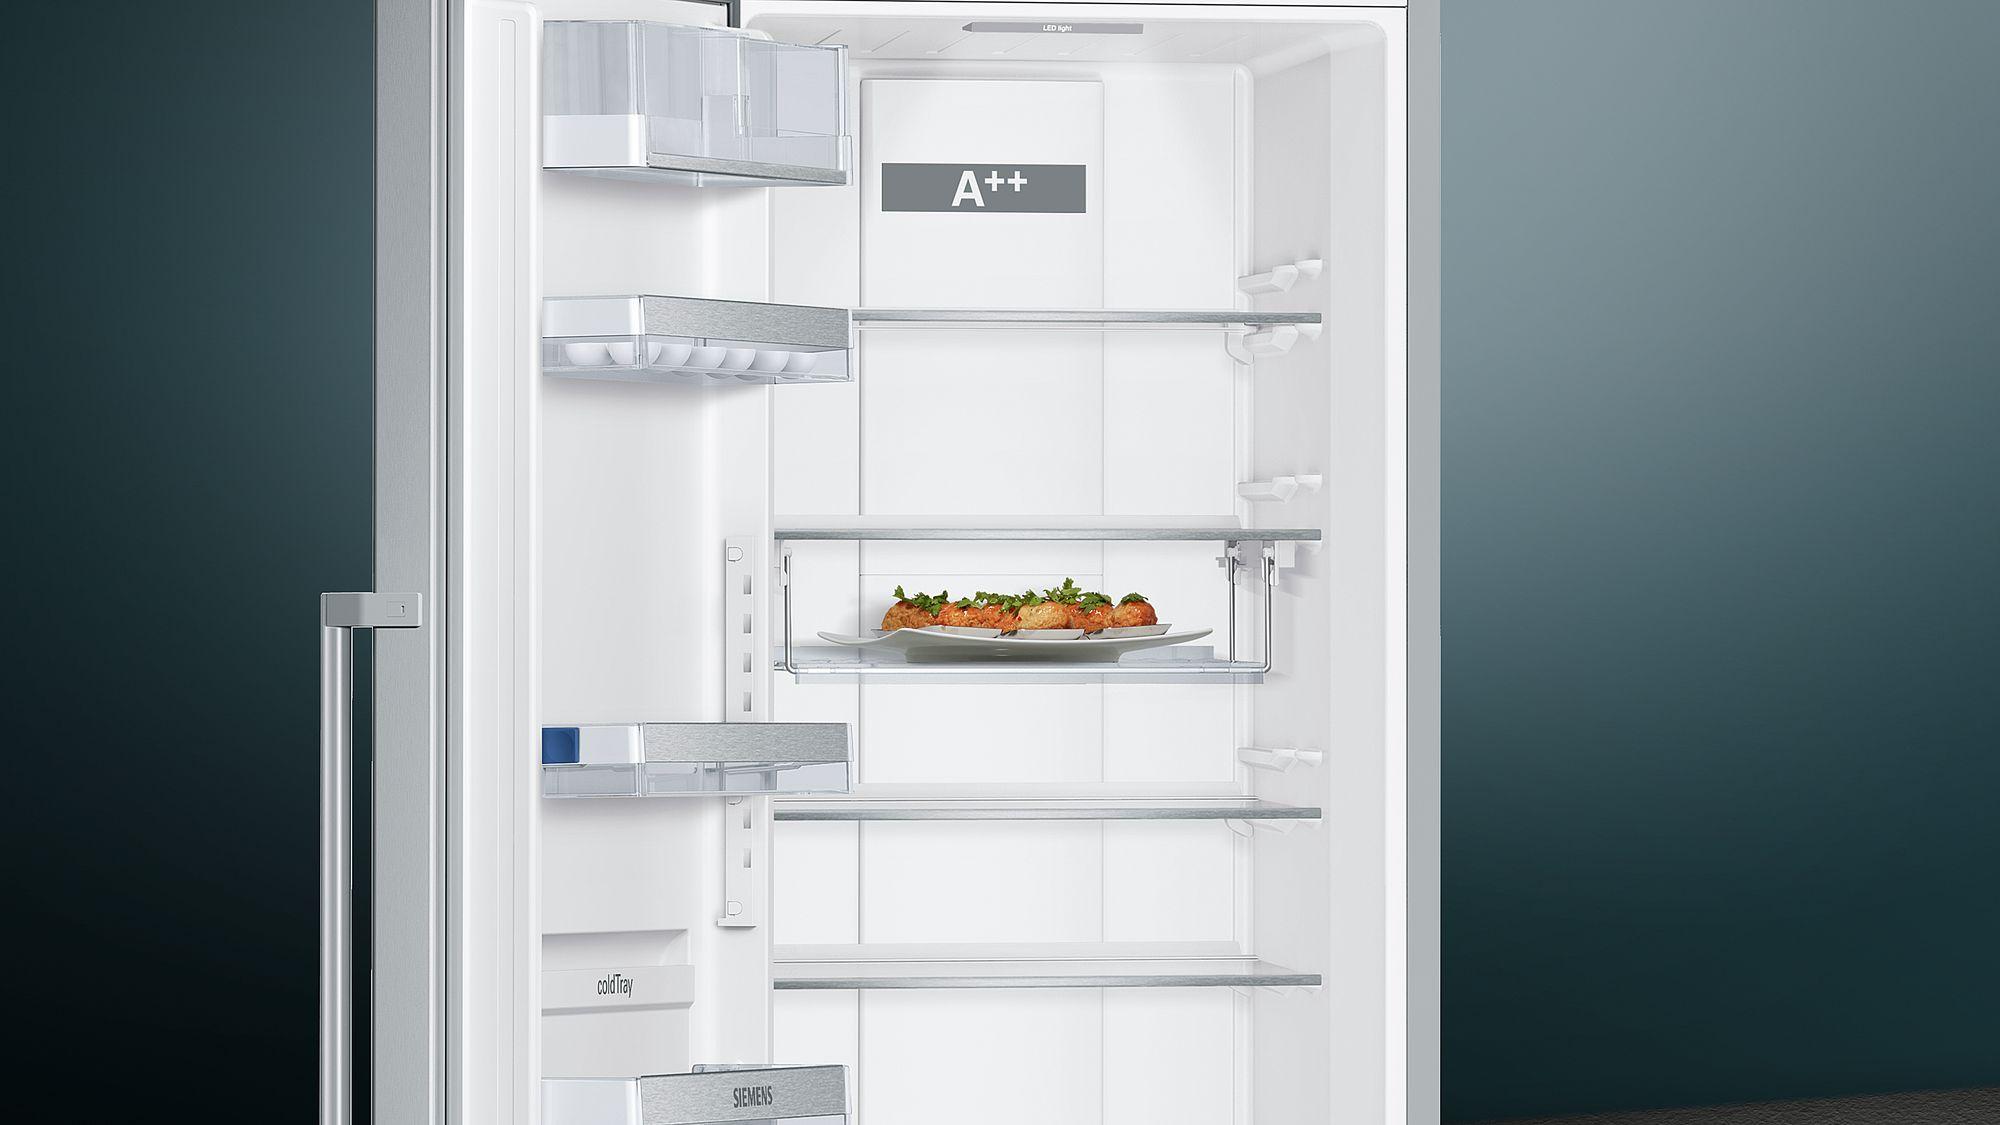 Kühlschrank Iq700 : Siemens stand kühlschrank iq edelstahl antifingerprint